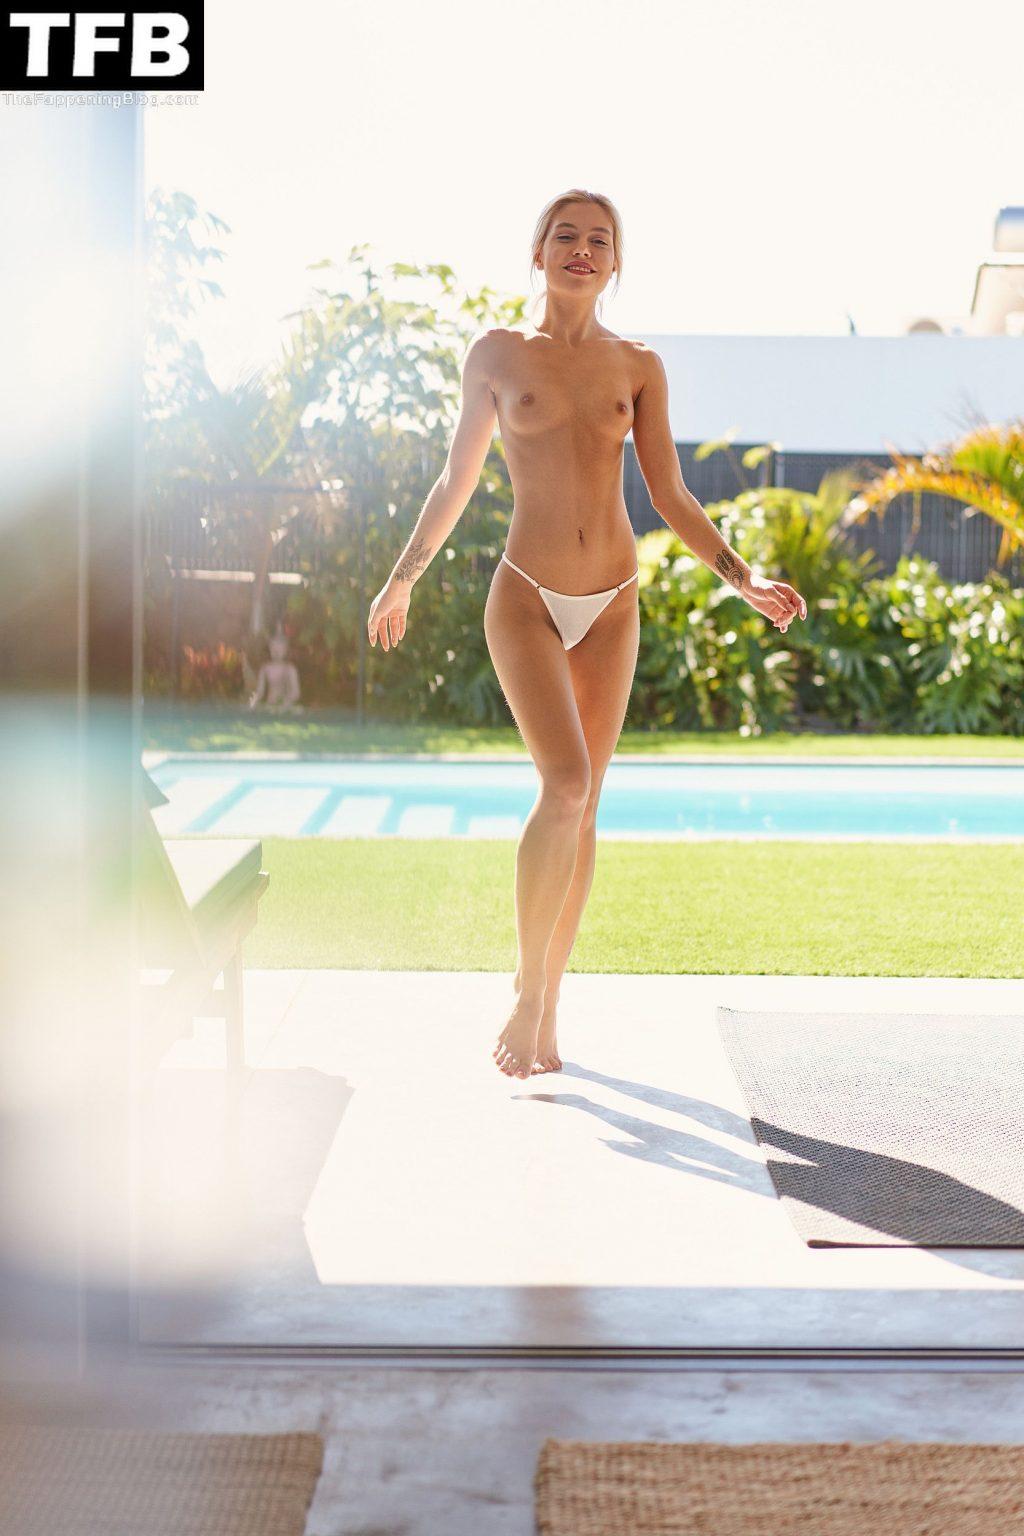 Margarita Gajewska Nude – Playboy (16 New Photos)